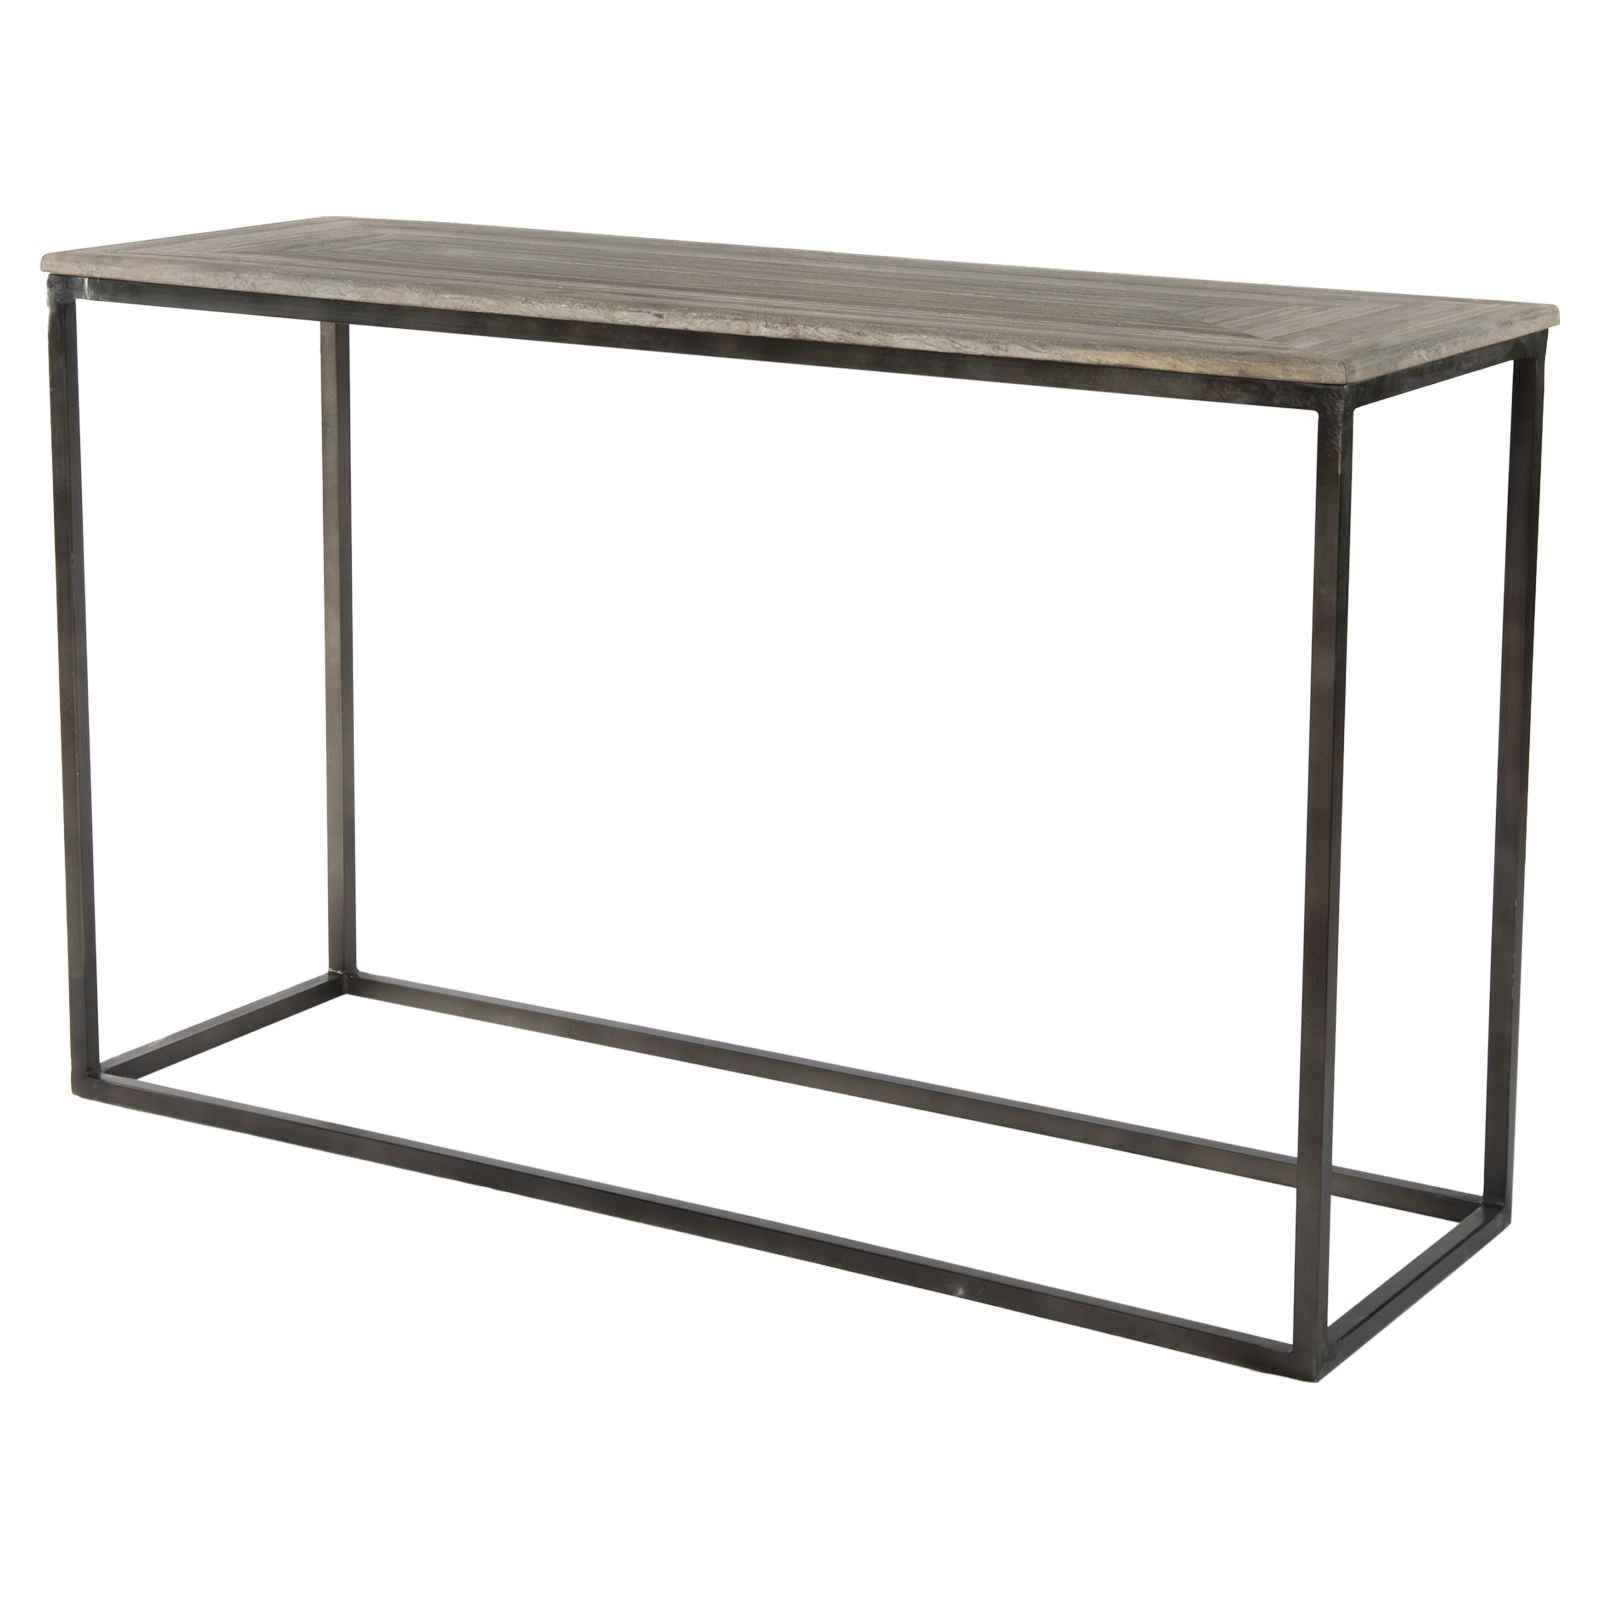 Elgar Lodge Metal Wood Console Table